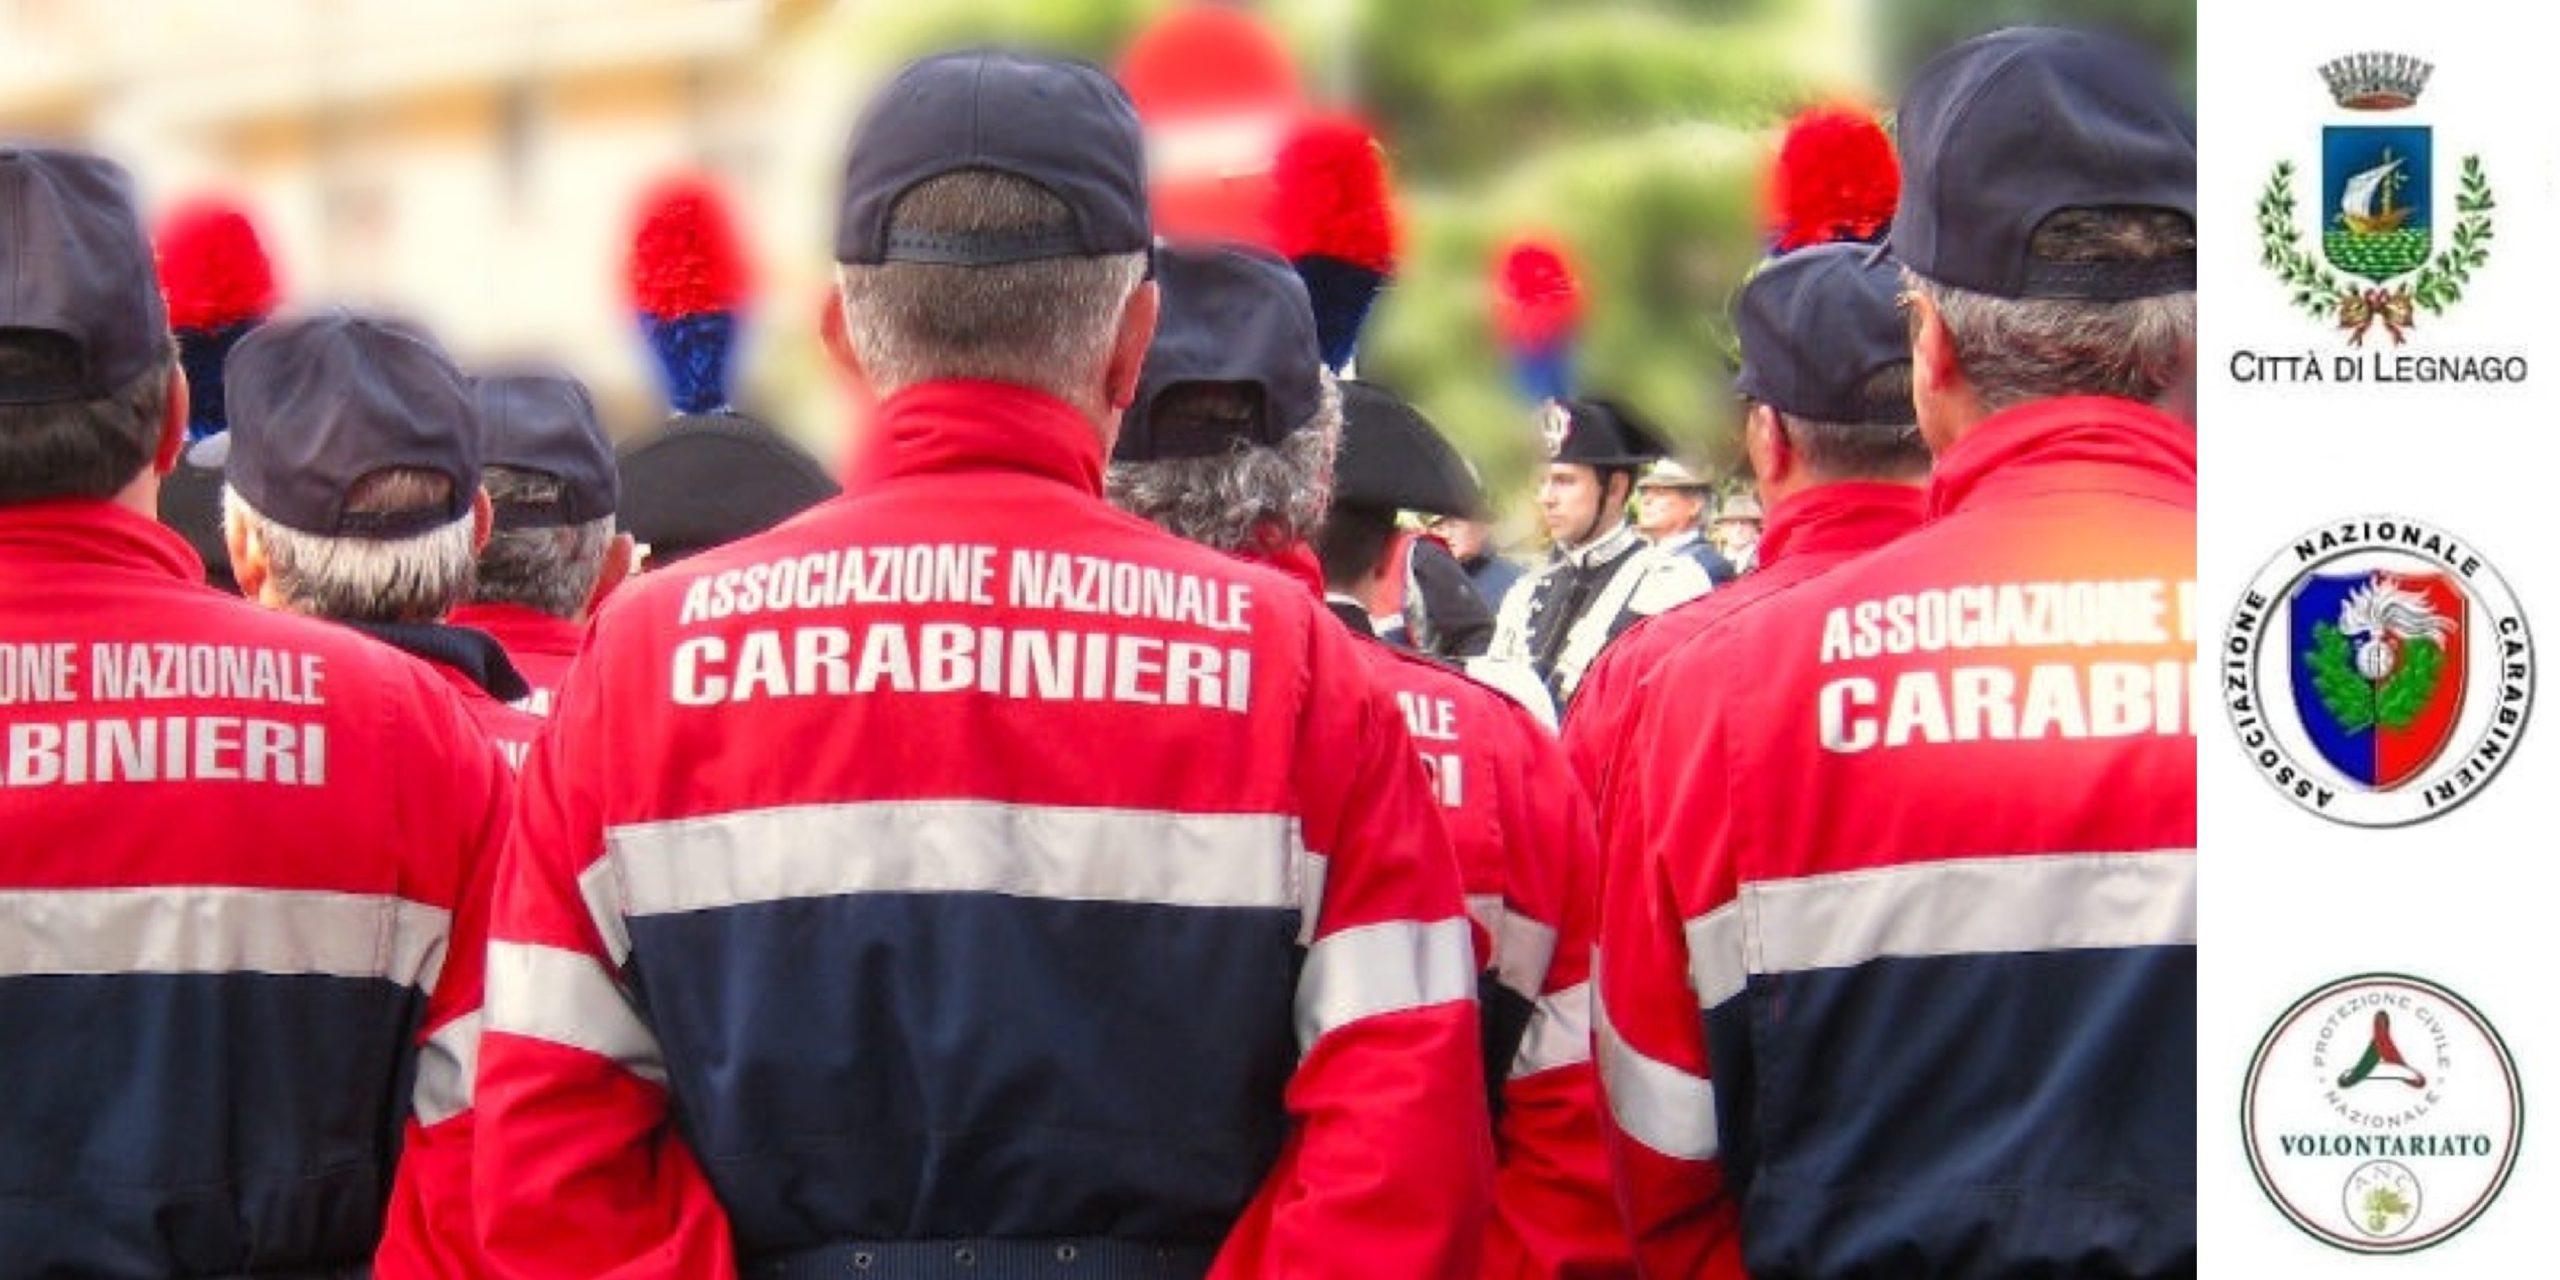 Associazione nazionale Carabinieri Airola, Ruggiero Presidente